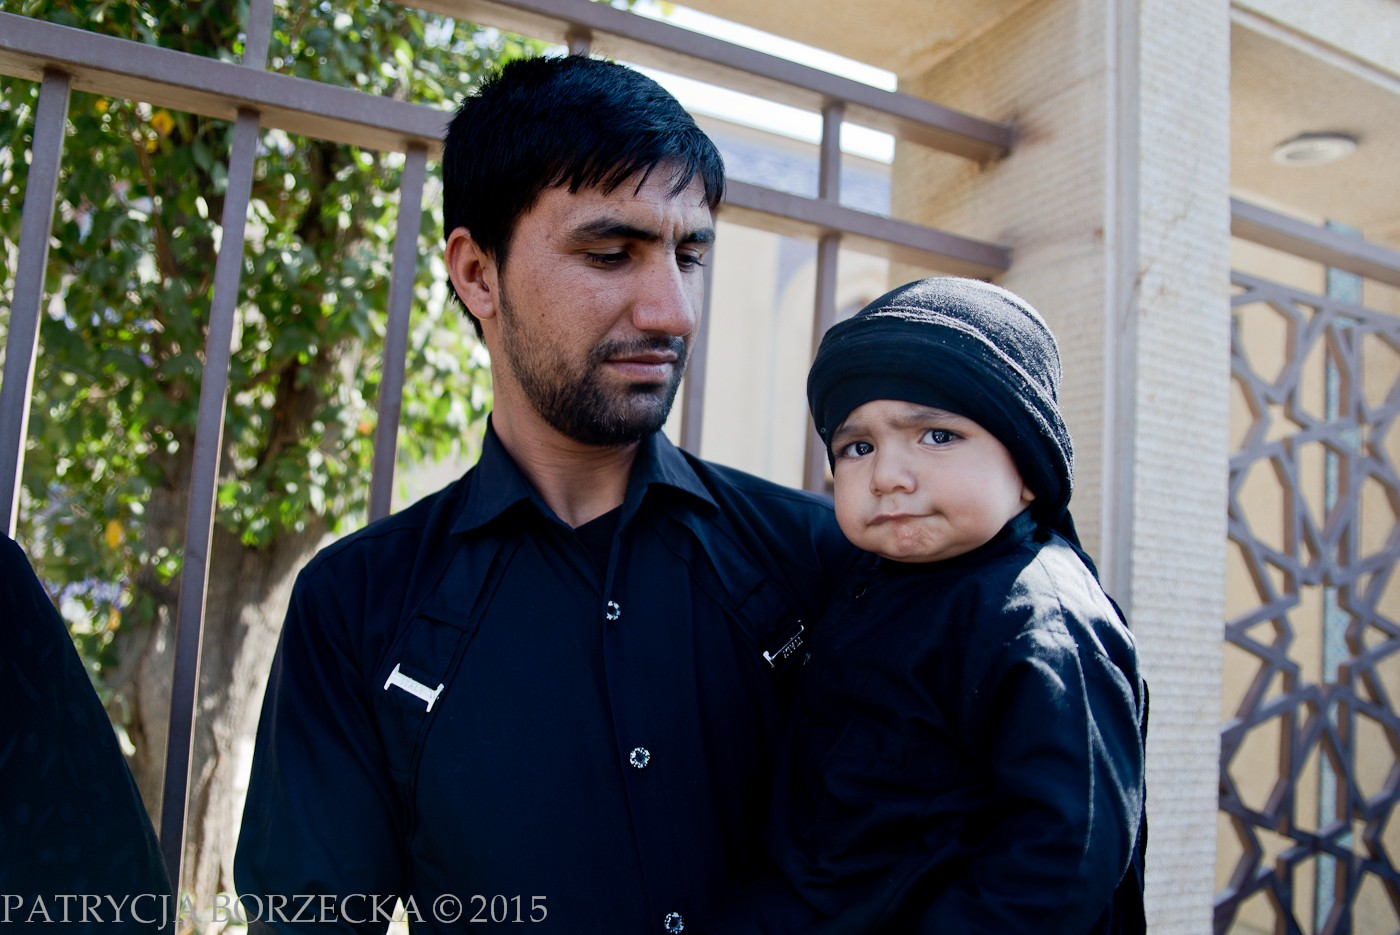 PatrycjaBorzecka-photography-Iran-people05